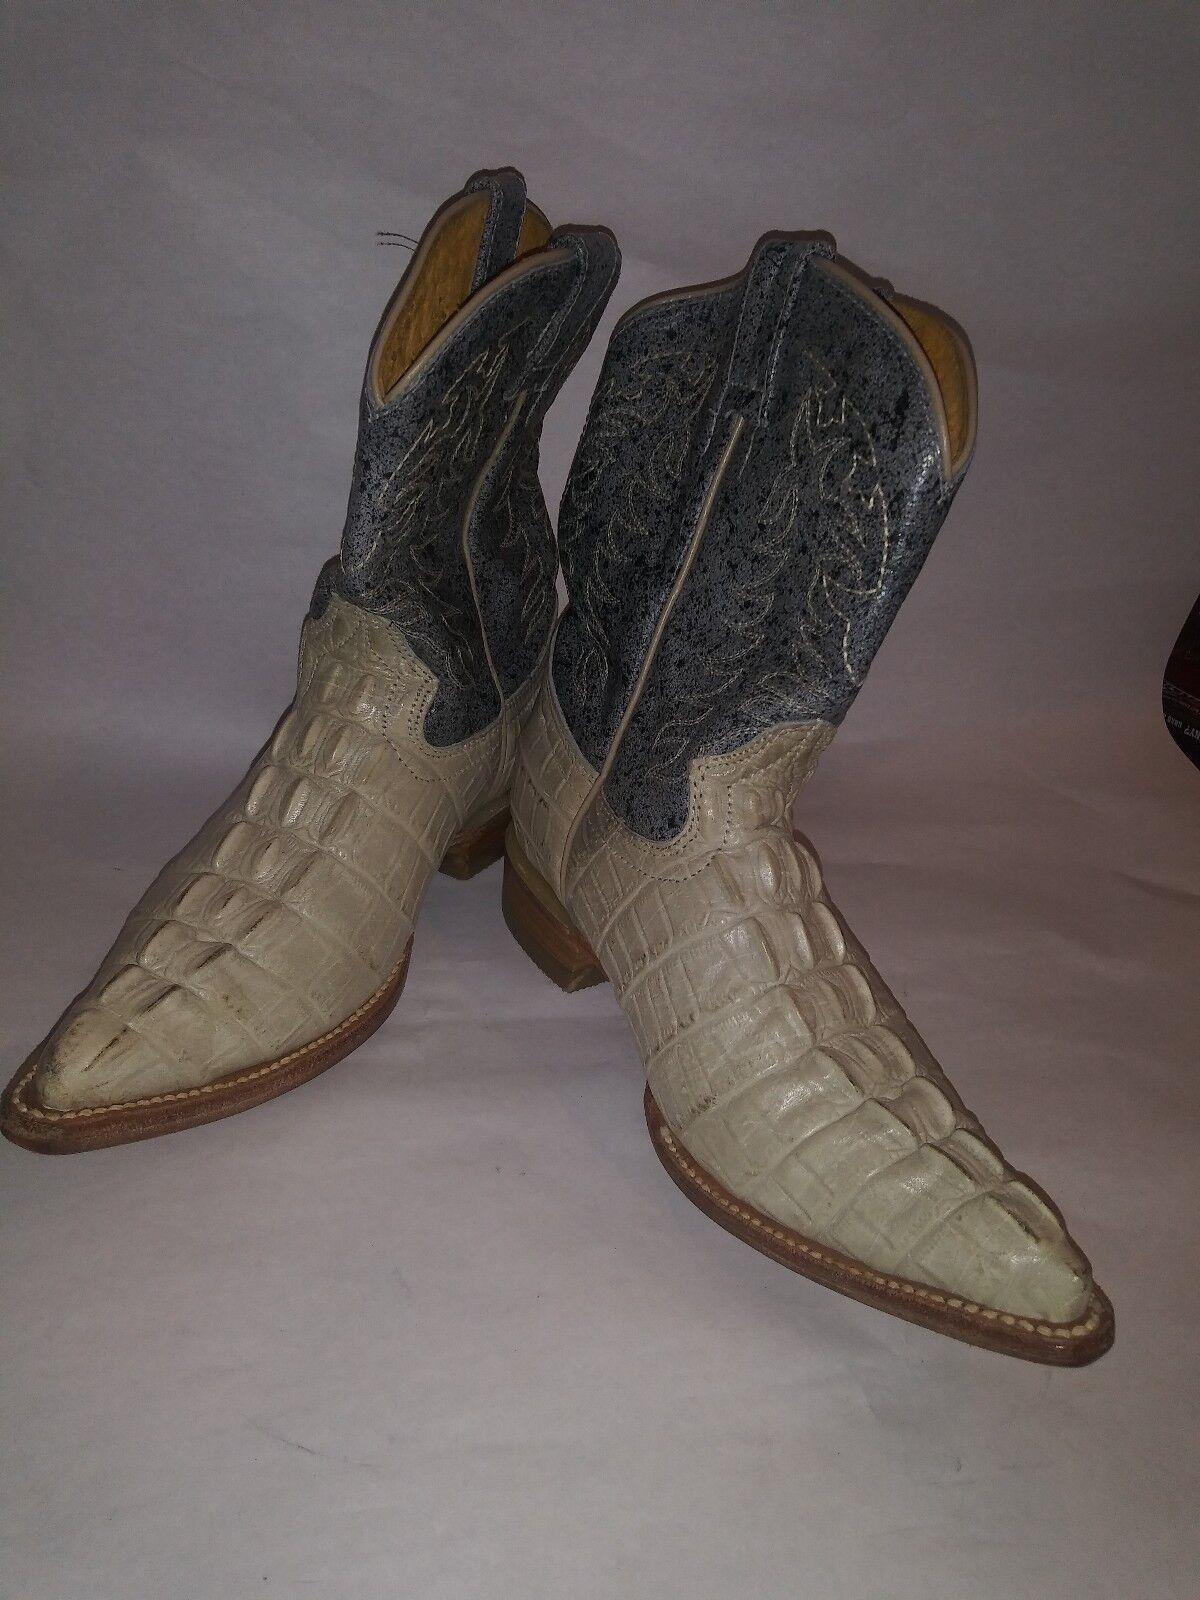 Western Premier Cowboy stivali  Crocodile Skin Collar Bone e blu Dimensione 5  prezzi bassi